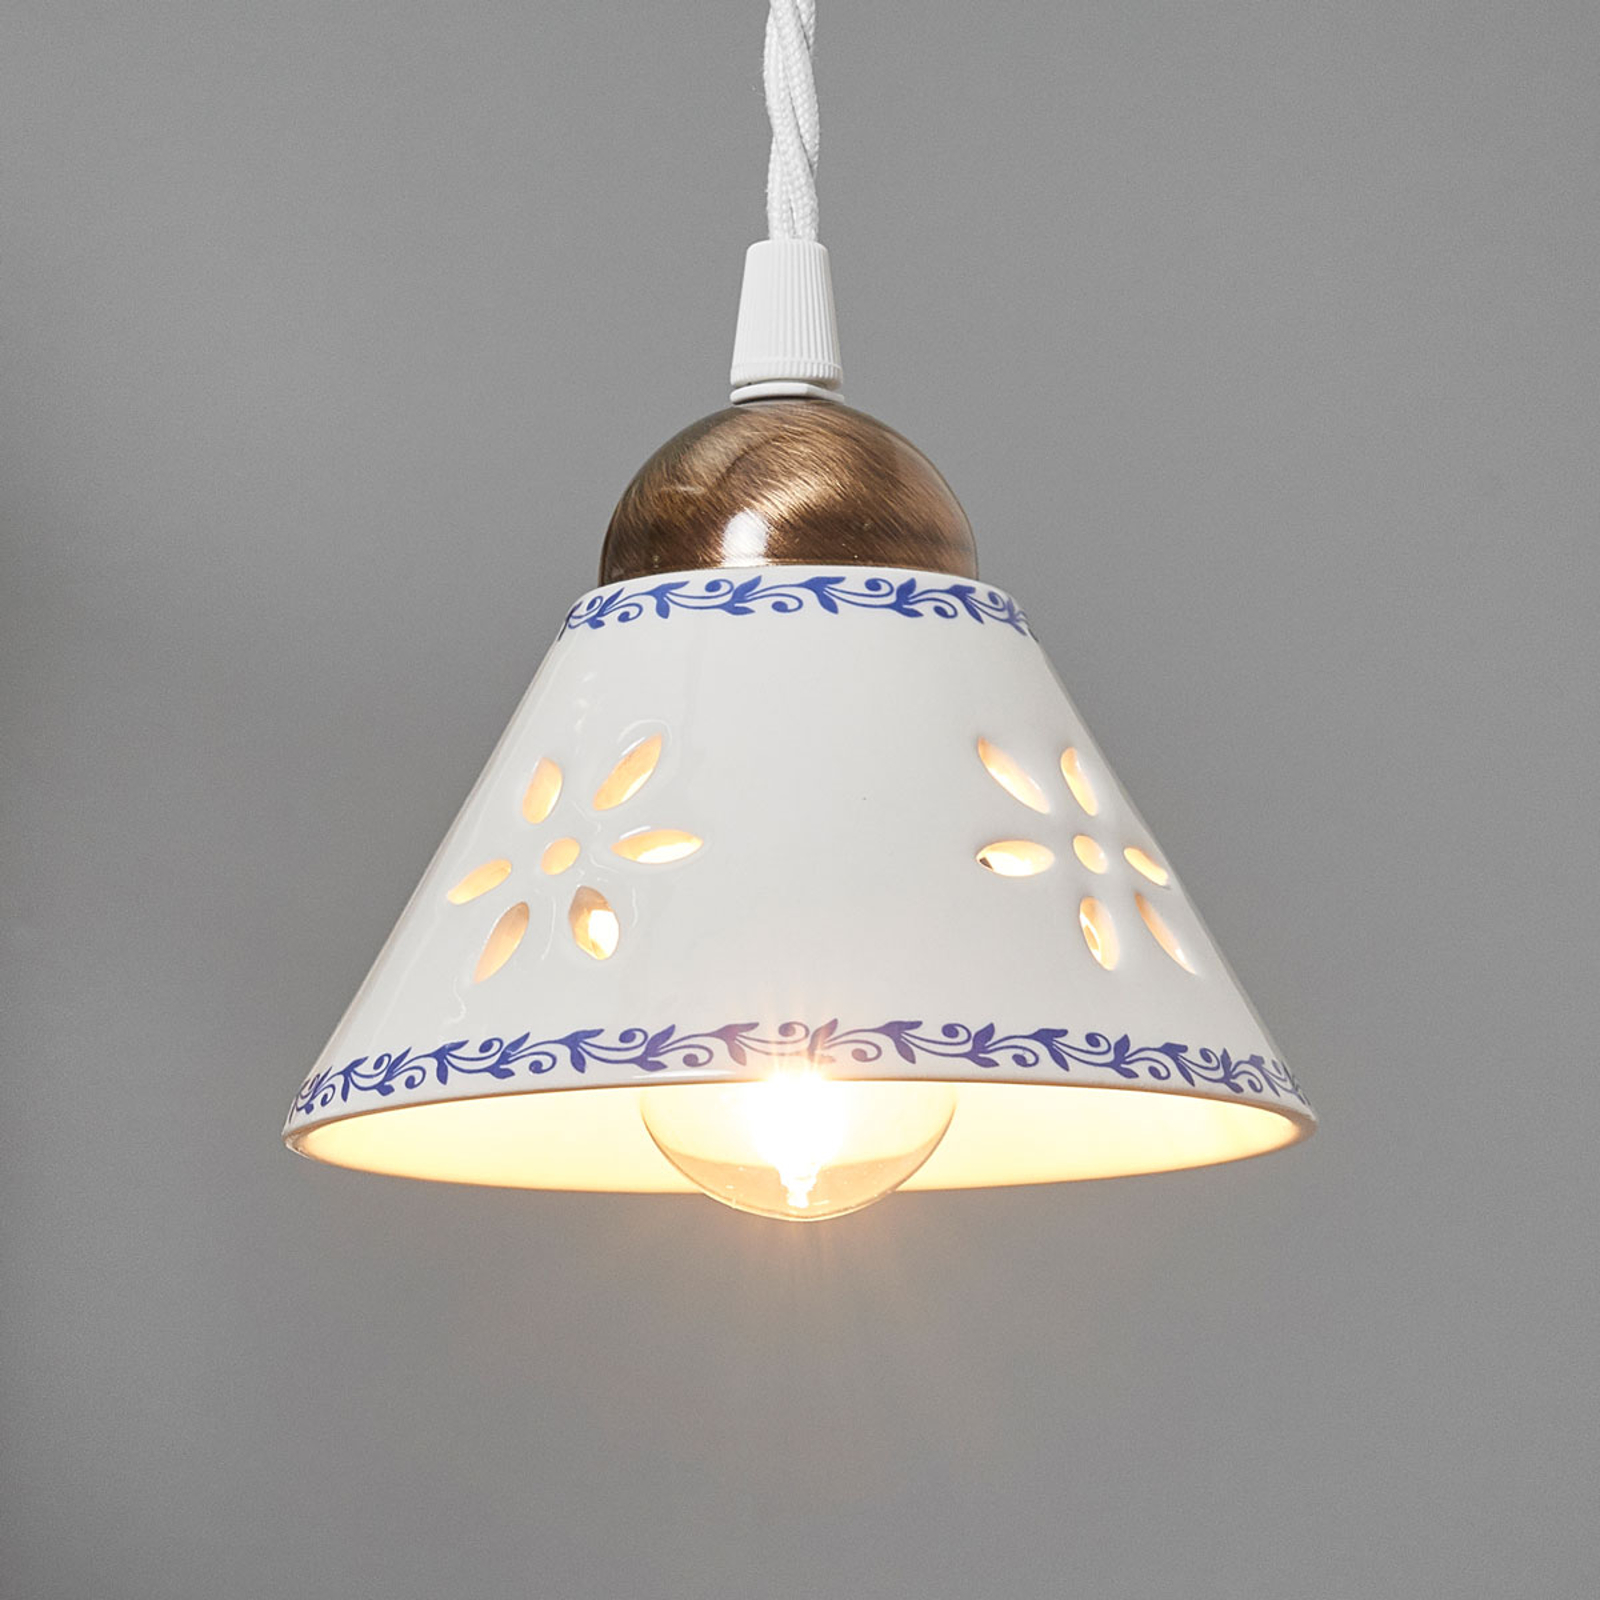 NONNA hanging light, made of white ceramic_2013026_1